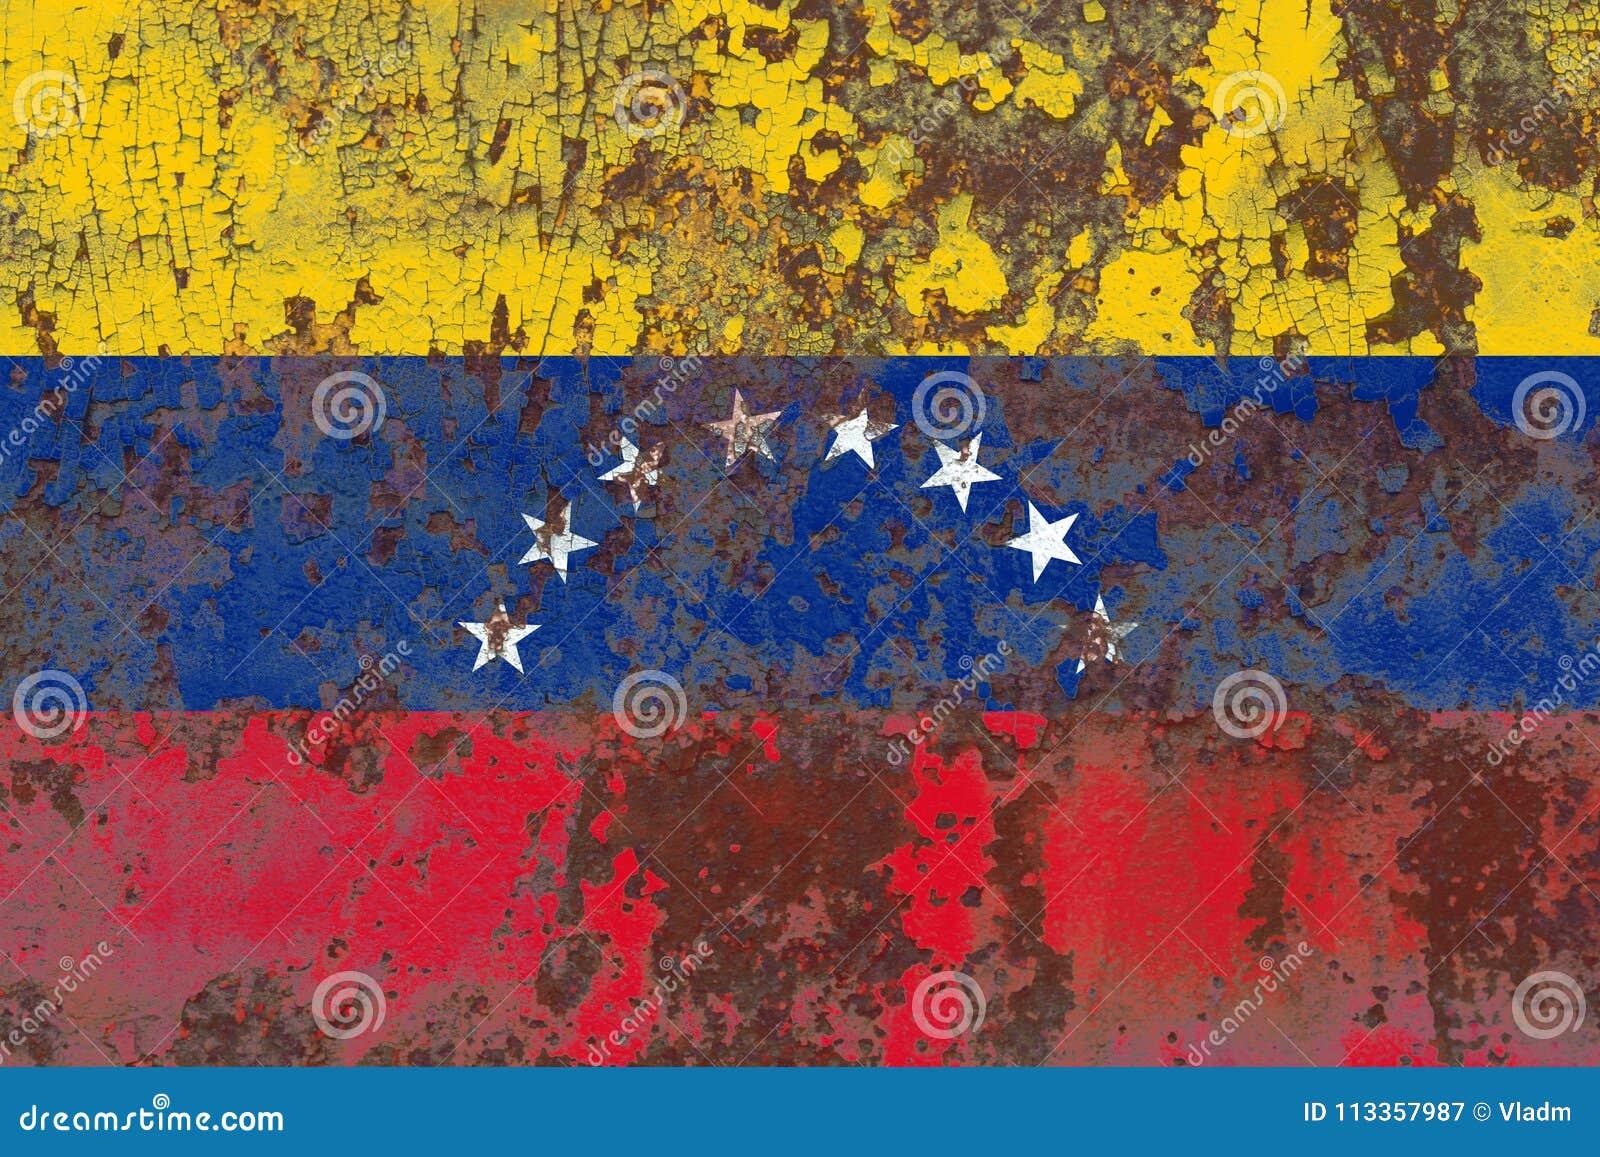 Old Venezuela grunge background flag